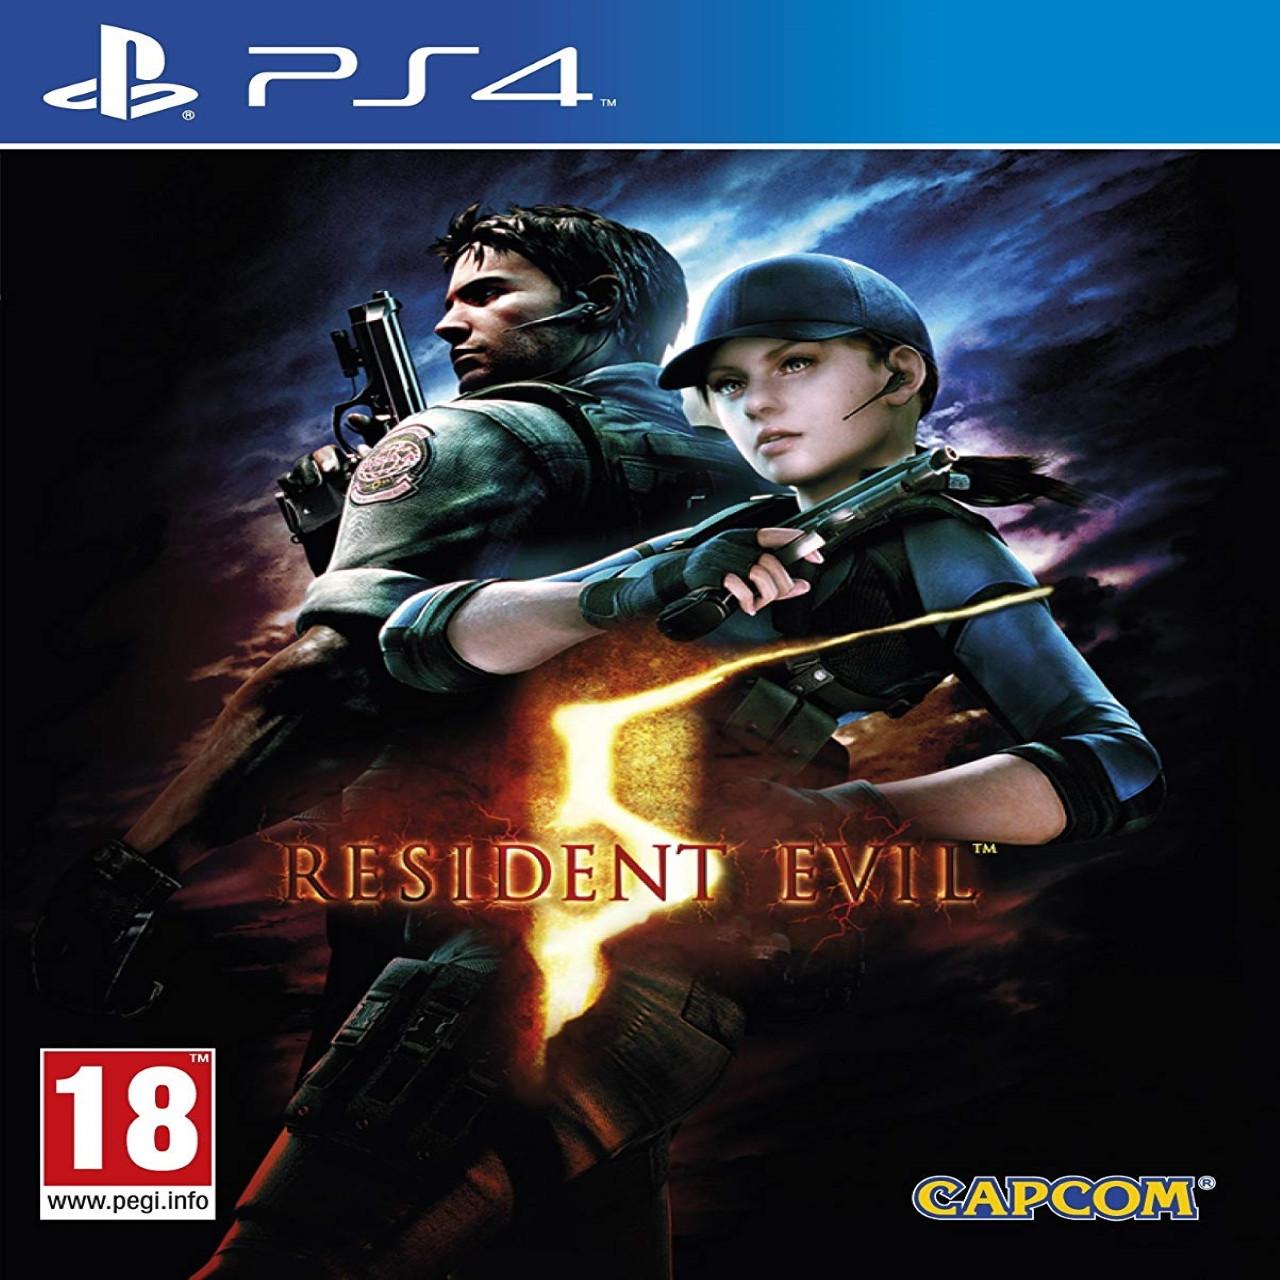 Resident Evil 5 ENG PS4 (NEW)